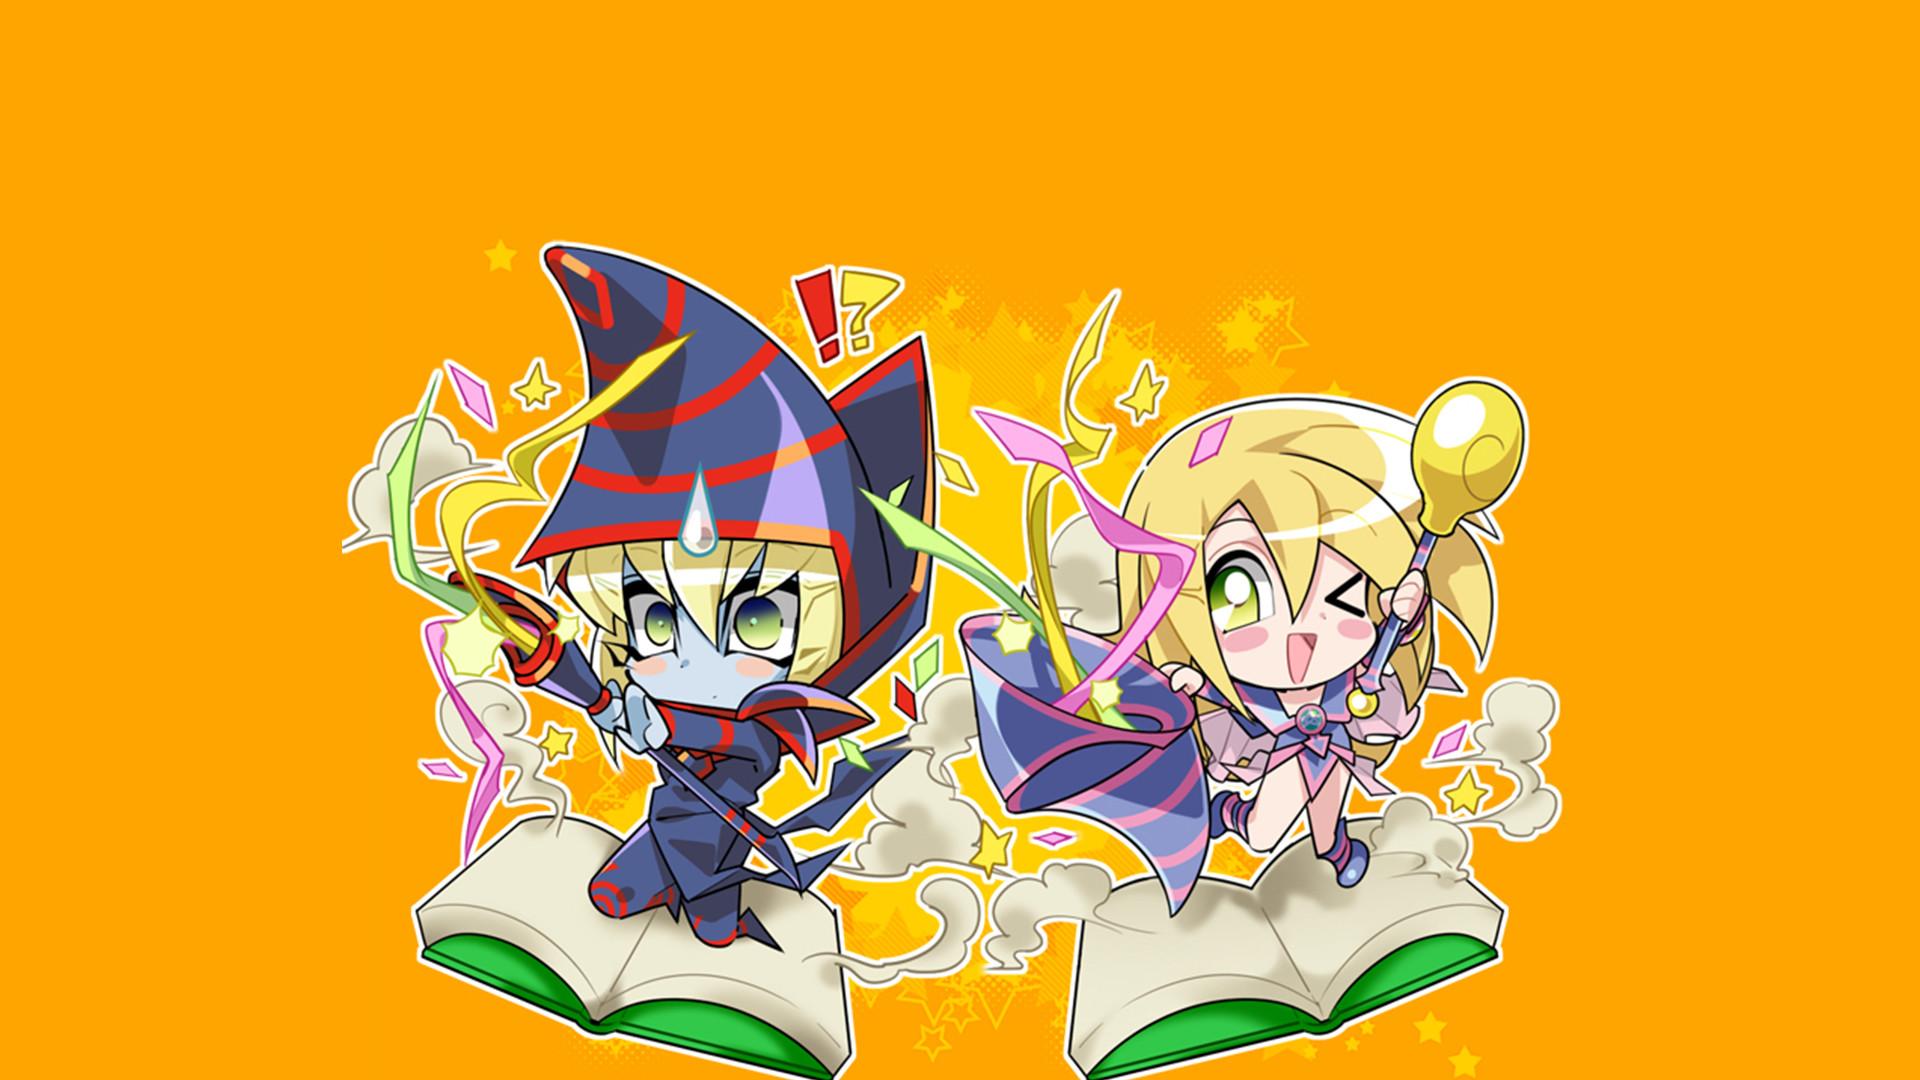 Res: 1920x1080, Anime - Yu-Gi-Oh! Dark Magician Girl Wallpaper